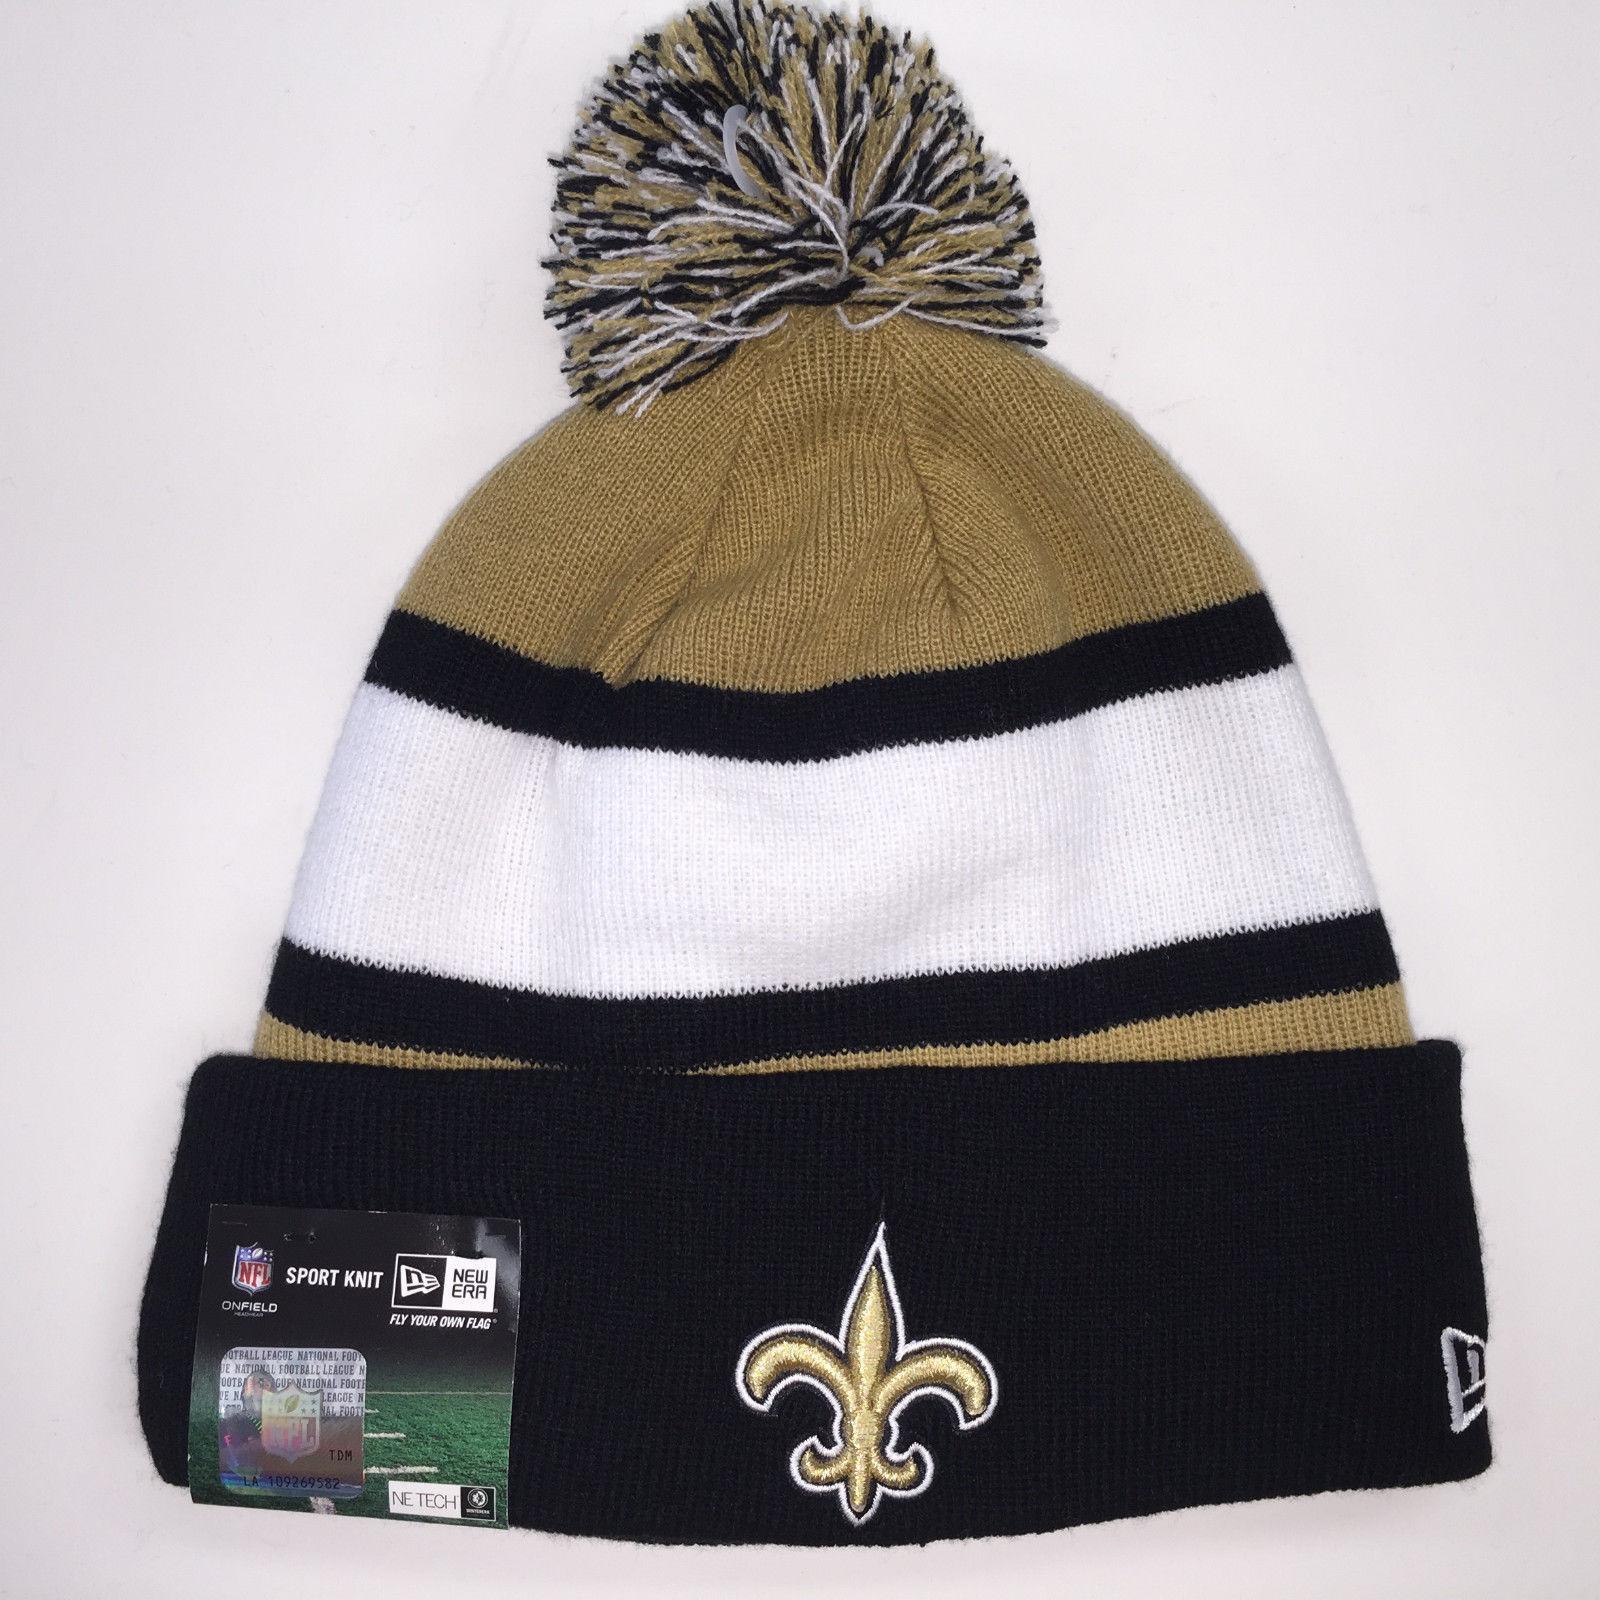 9dc6e18a New Era New Orleans Saints NFL 2013 Sport and 50 similar items